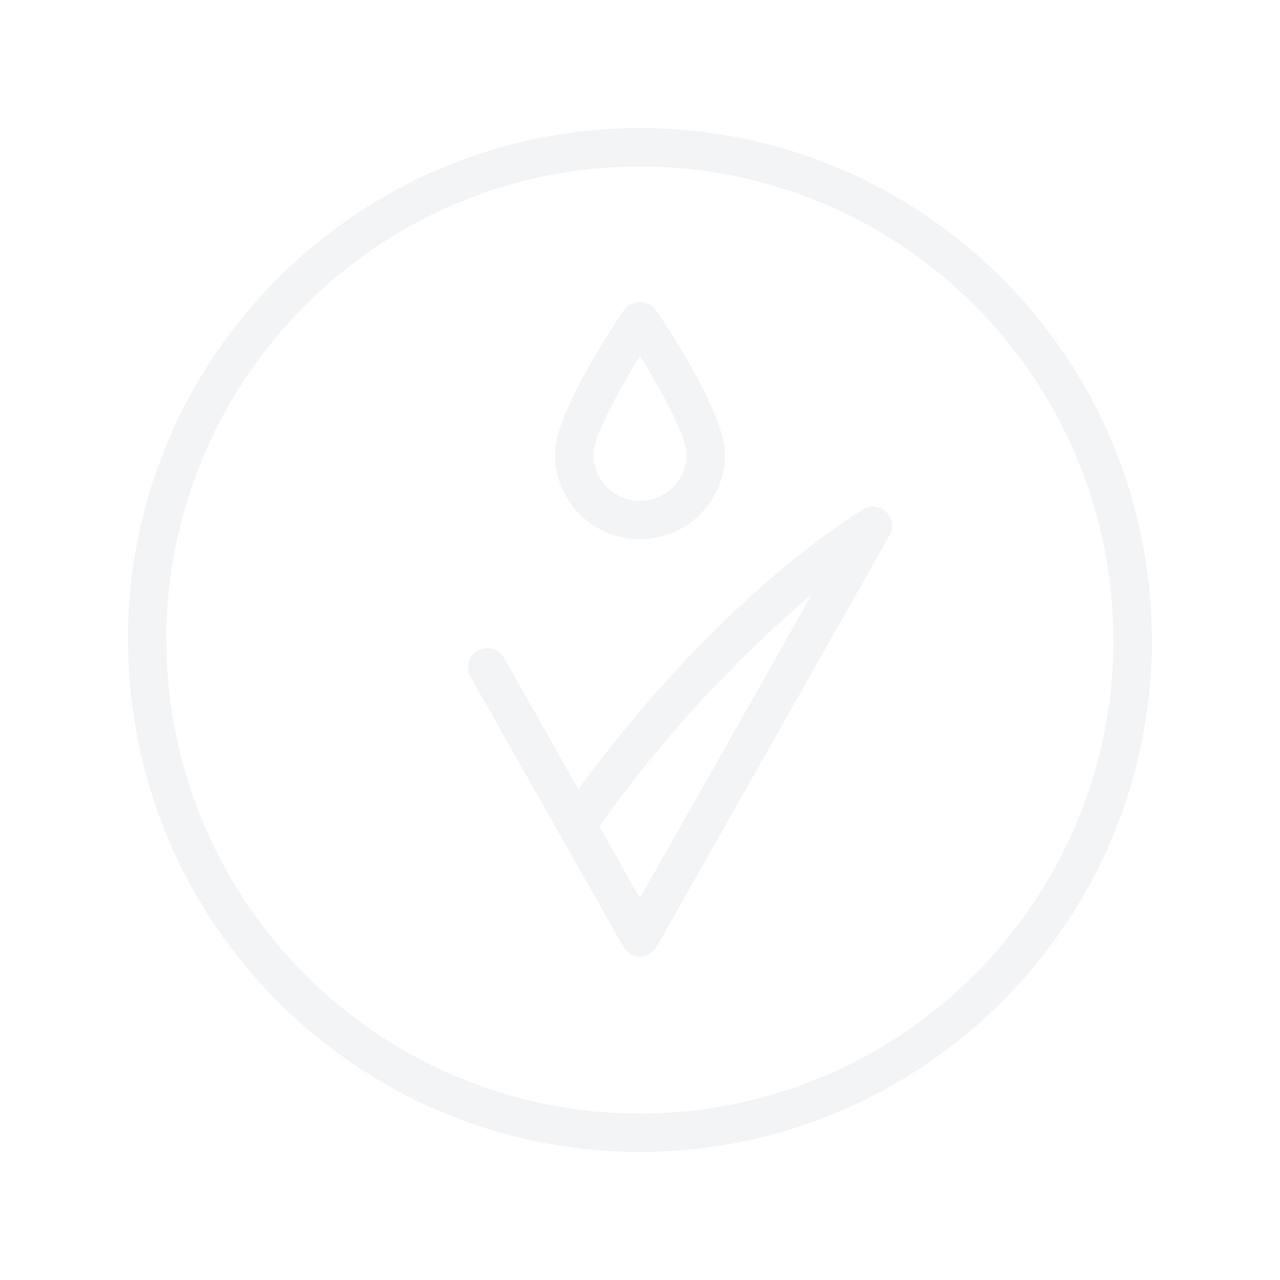 REAL TECHNIQUES Crush Volume II 304 Fan Brush